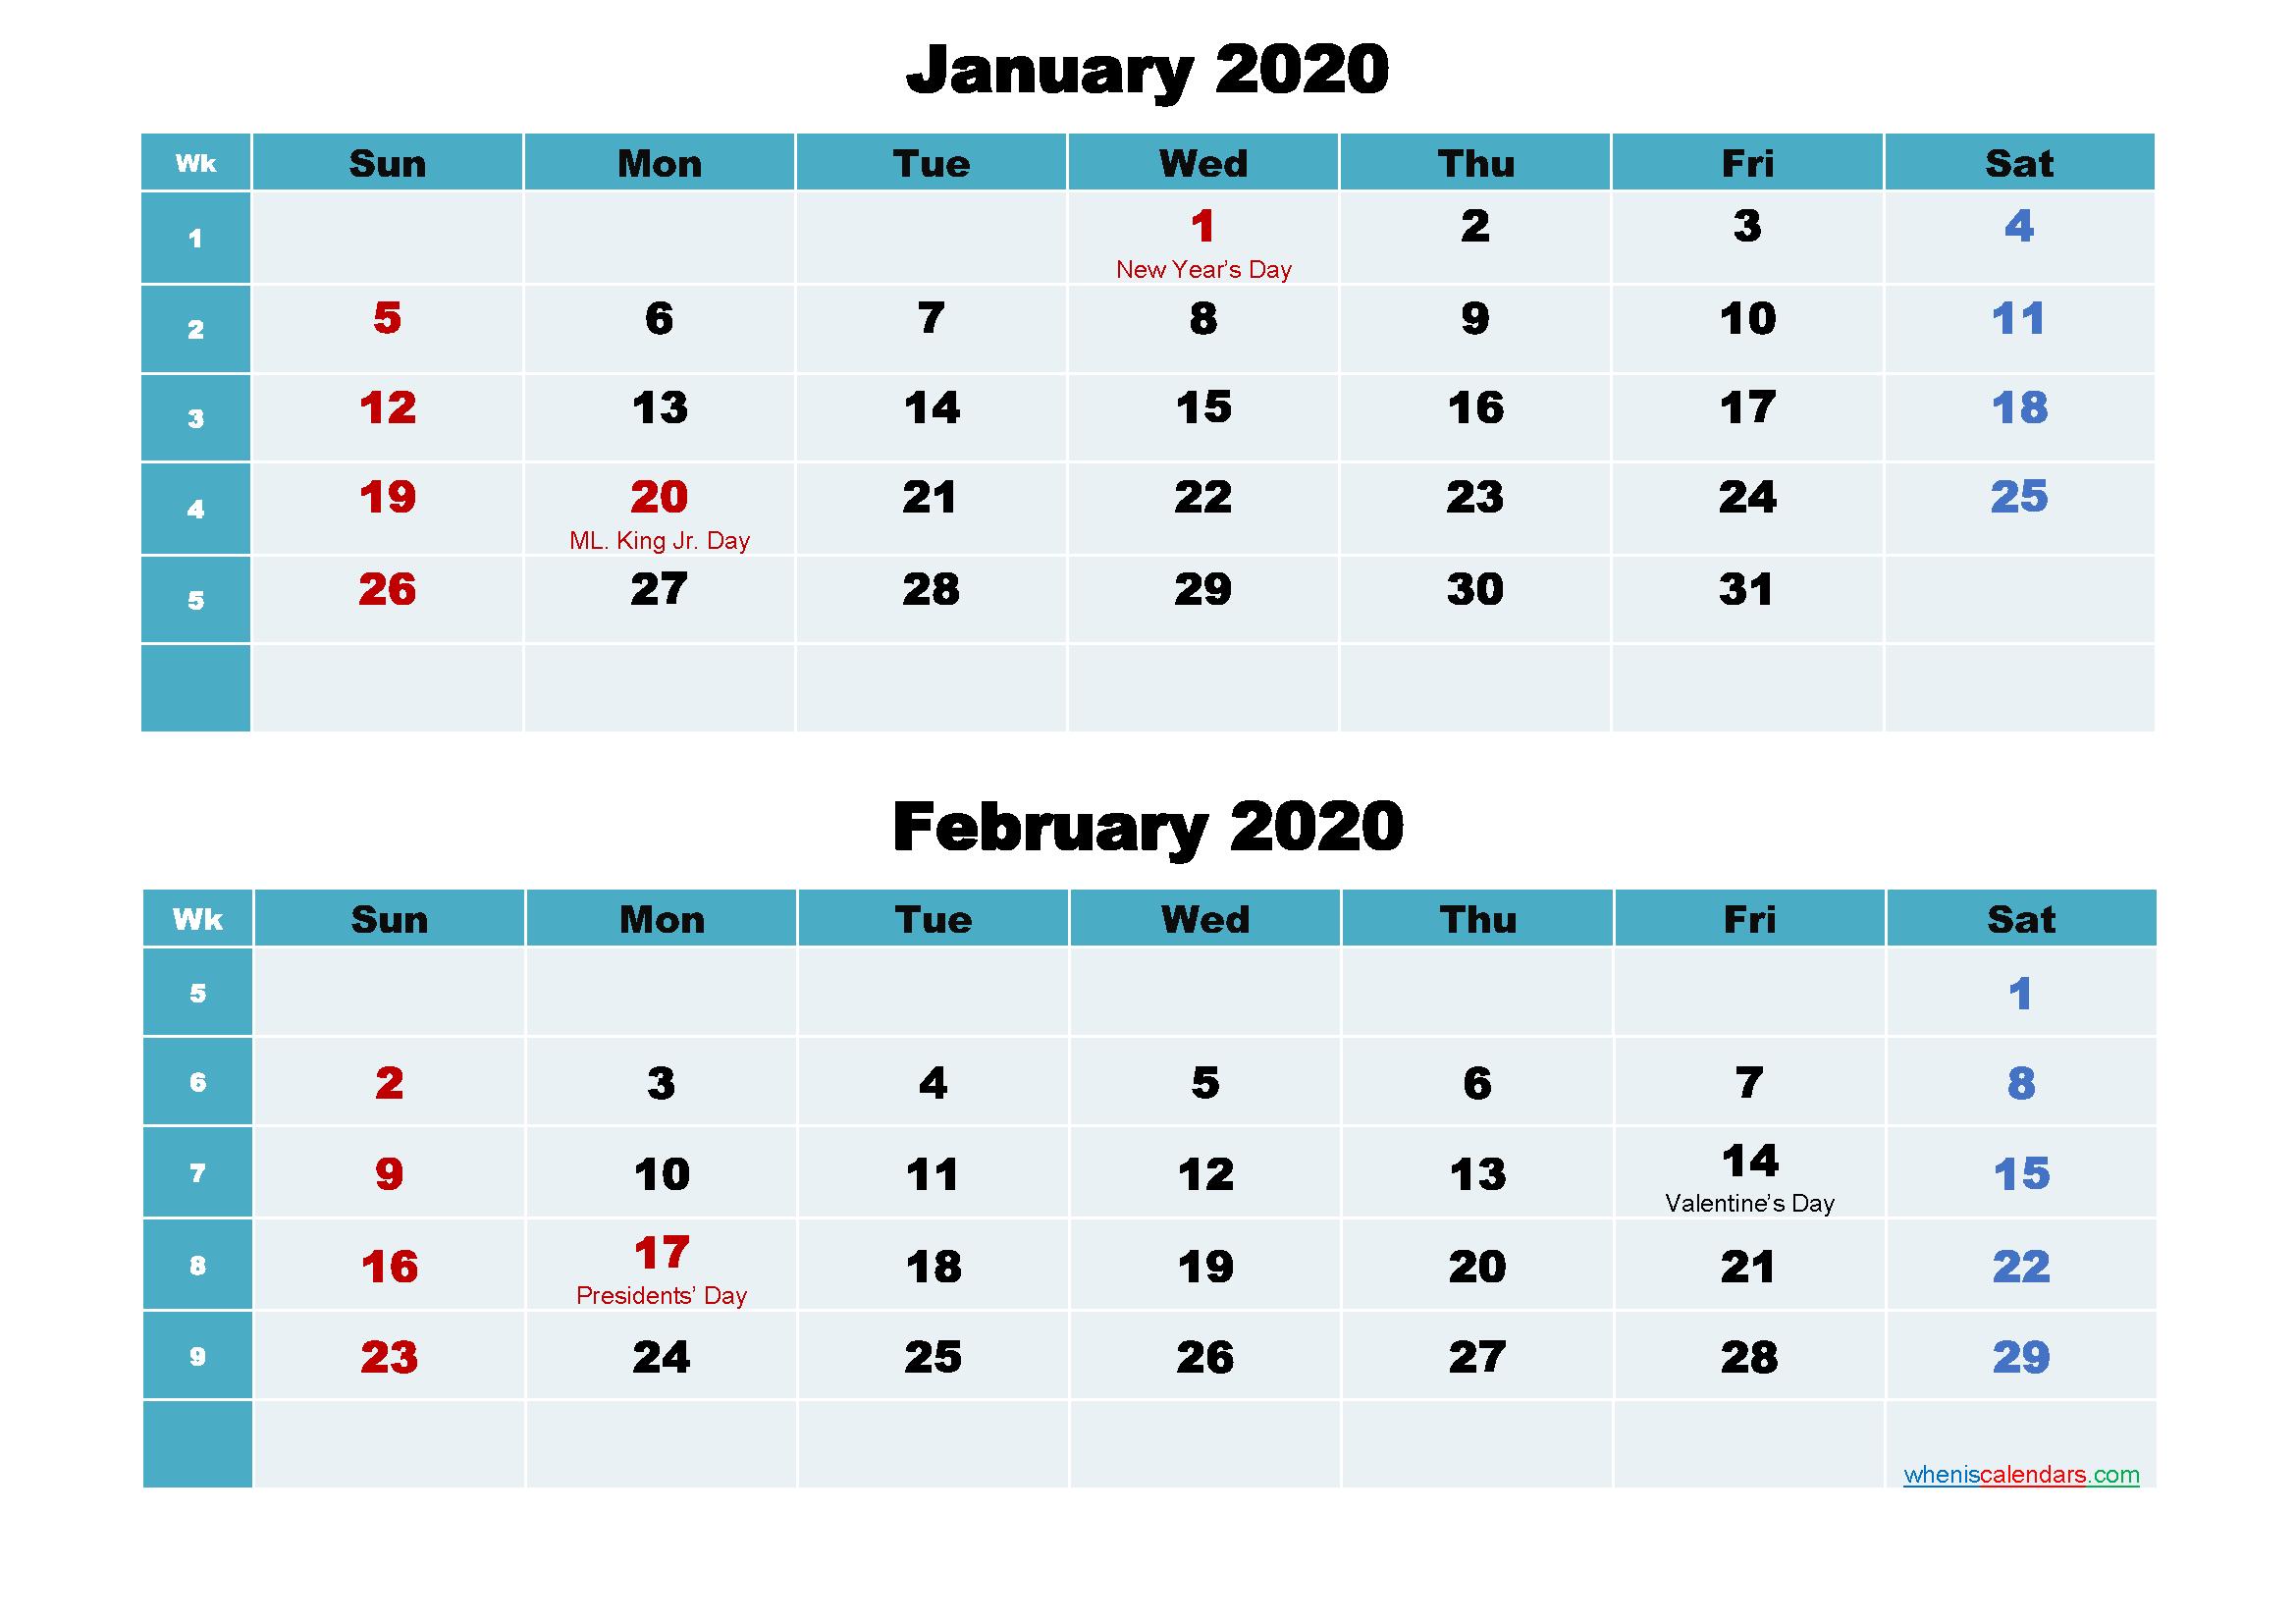 January and February 2020 Calendar with Holidays